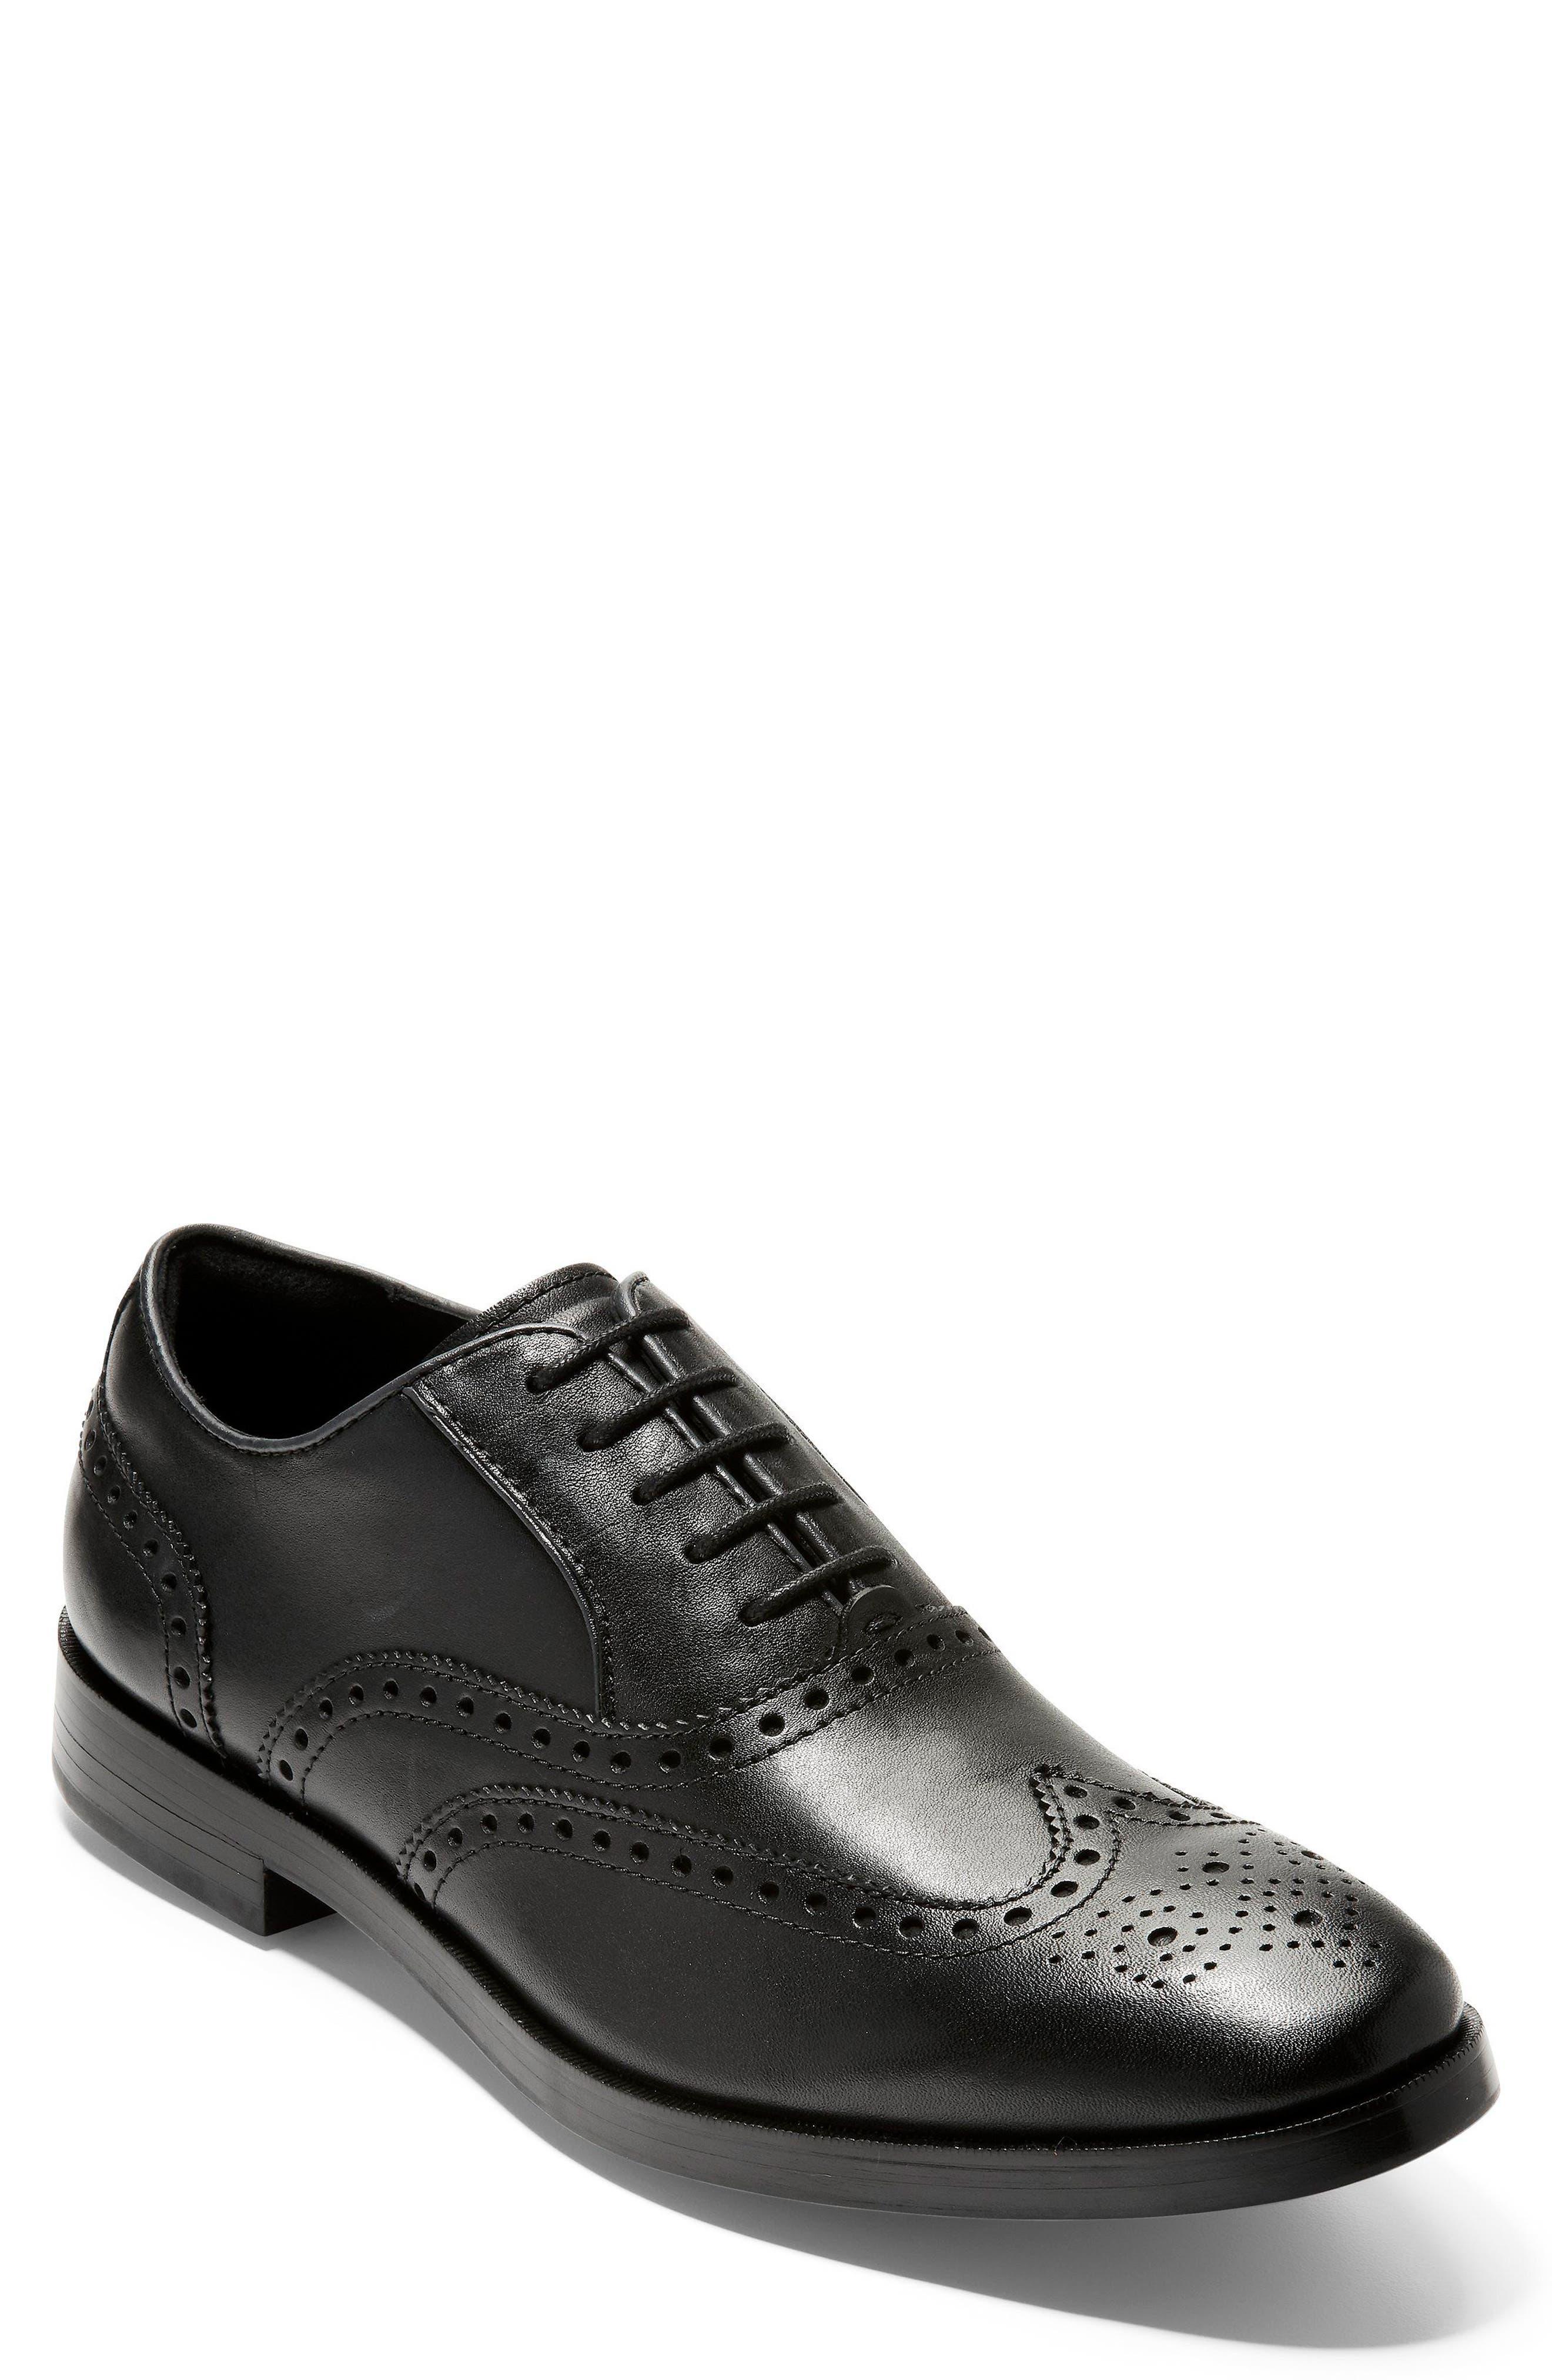 Hamilton Grand Wing-Tip Oxford, Black in Black Leather